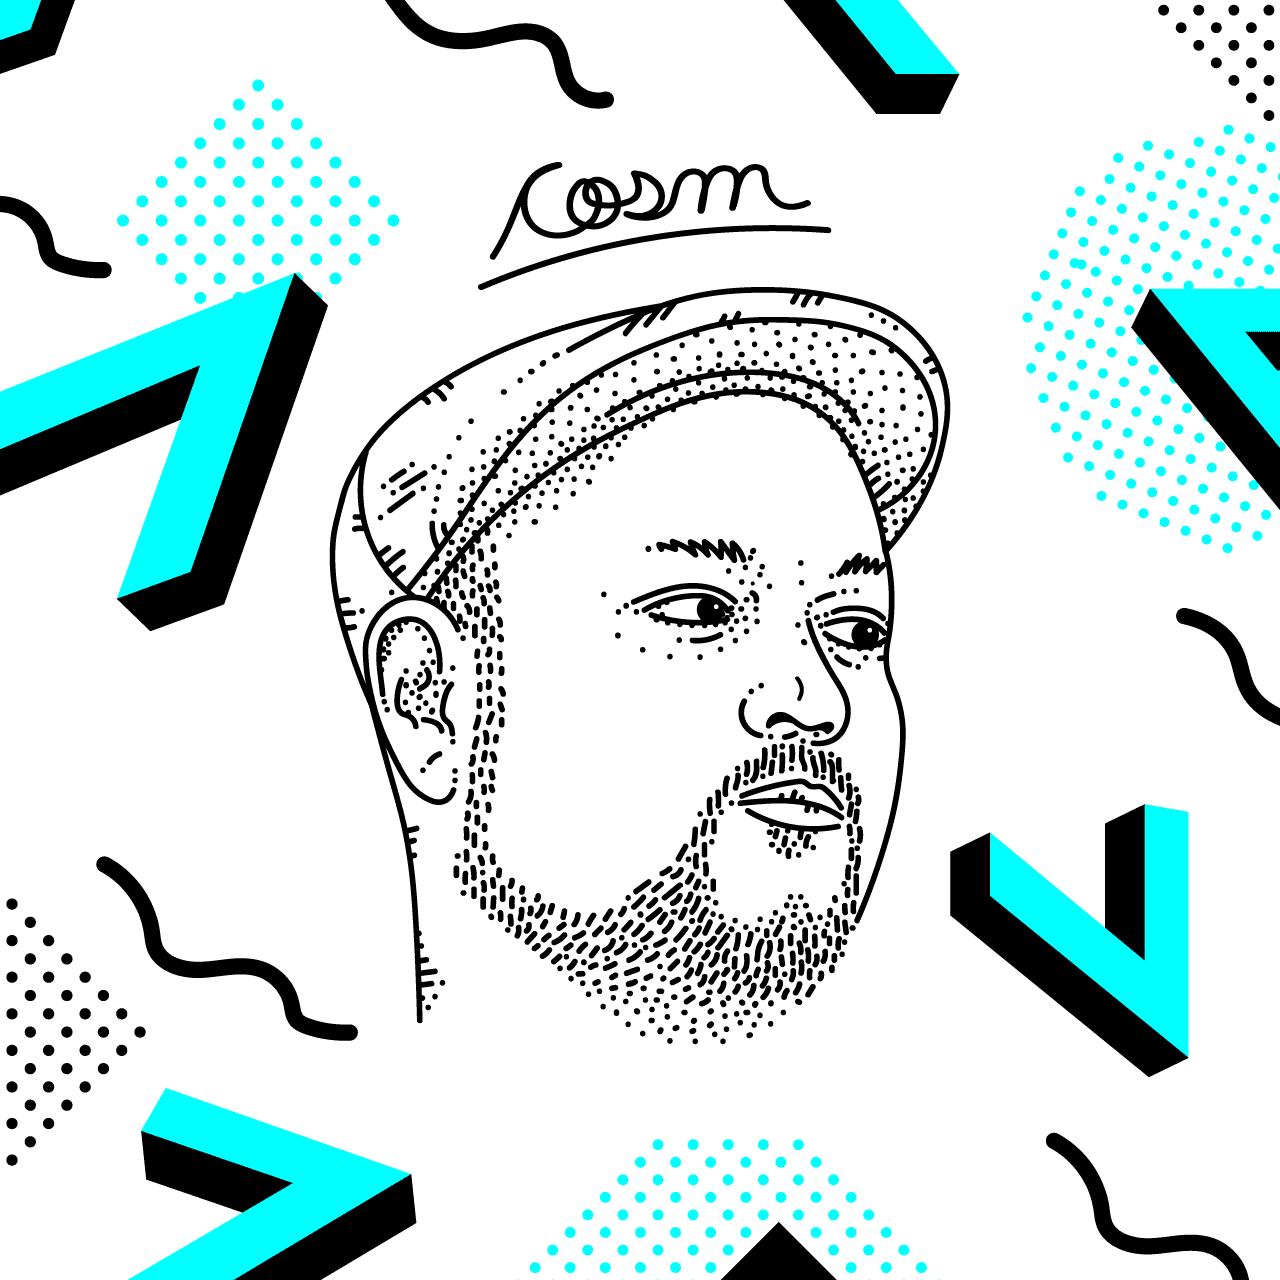 Episode 17 - DJ Cosm - Make Believe Records